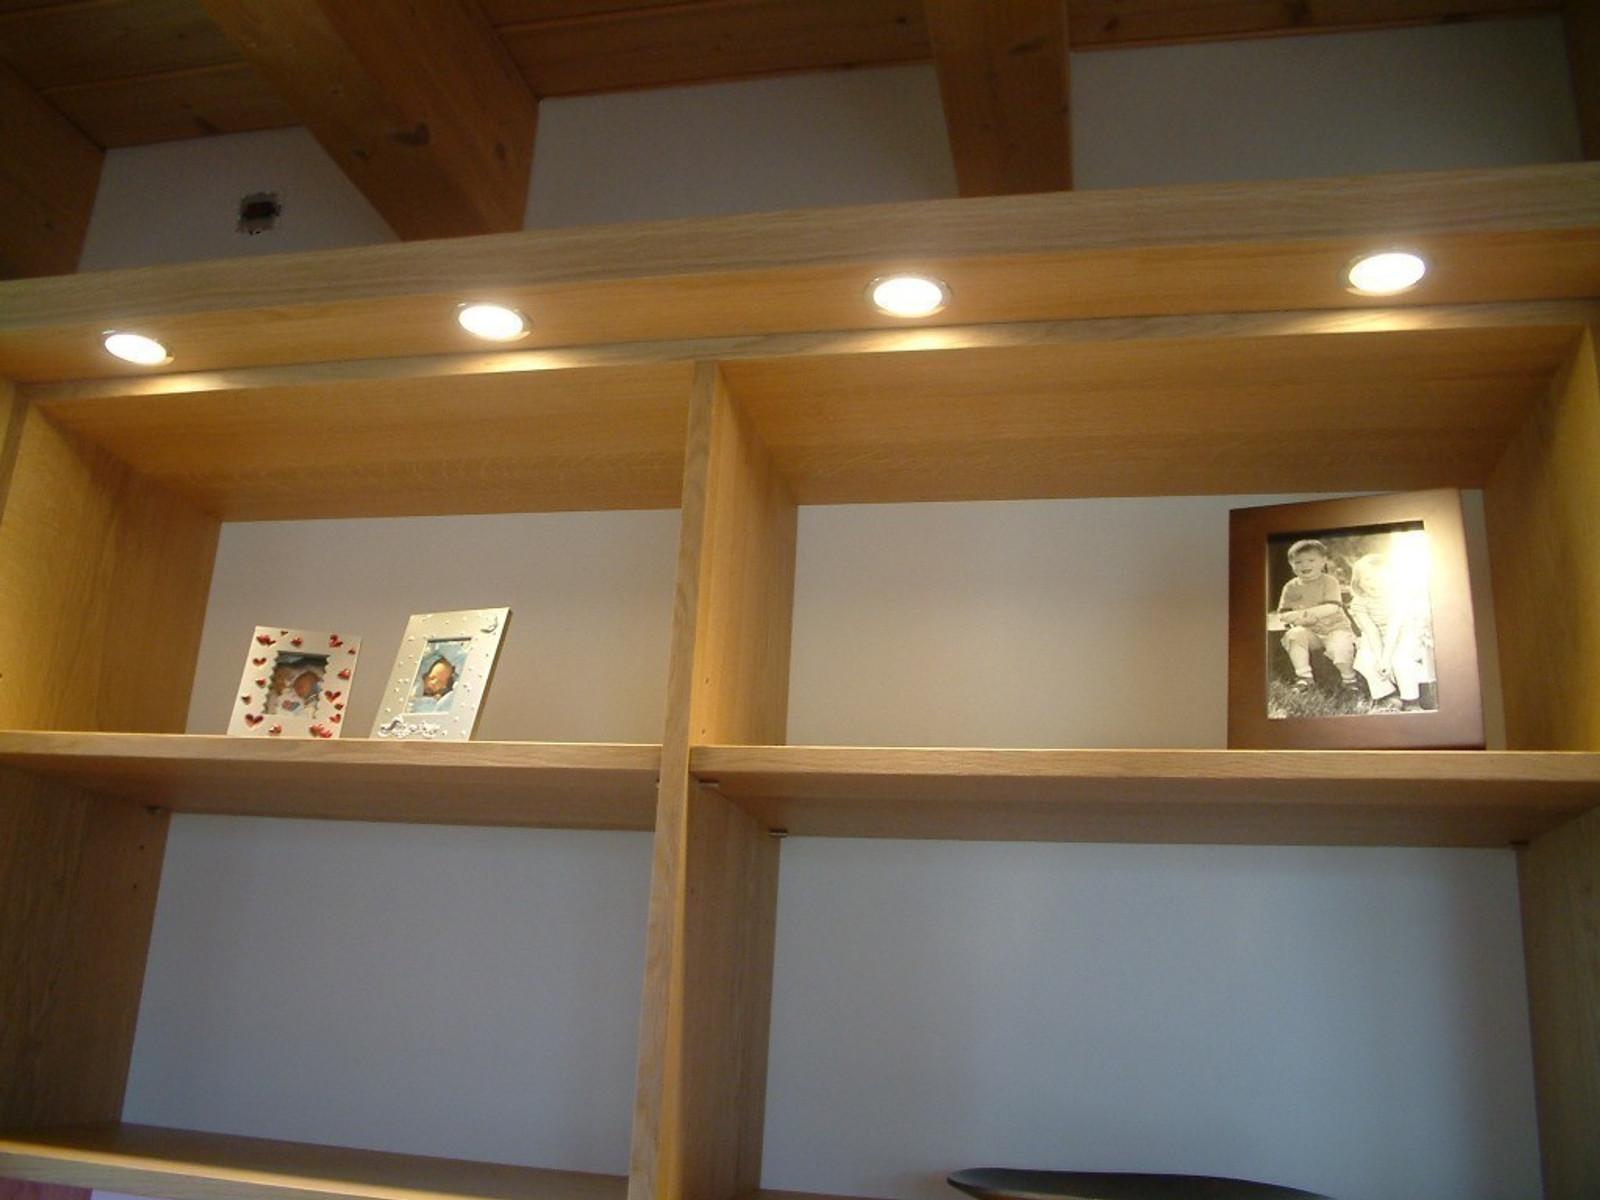 moderne wohnwand mit offenem fach f r plasma tv tv. Black Bedroom Furniture Sets. Home Design Ideas